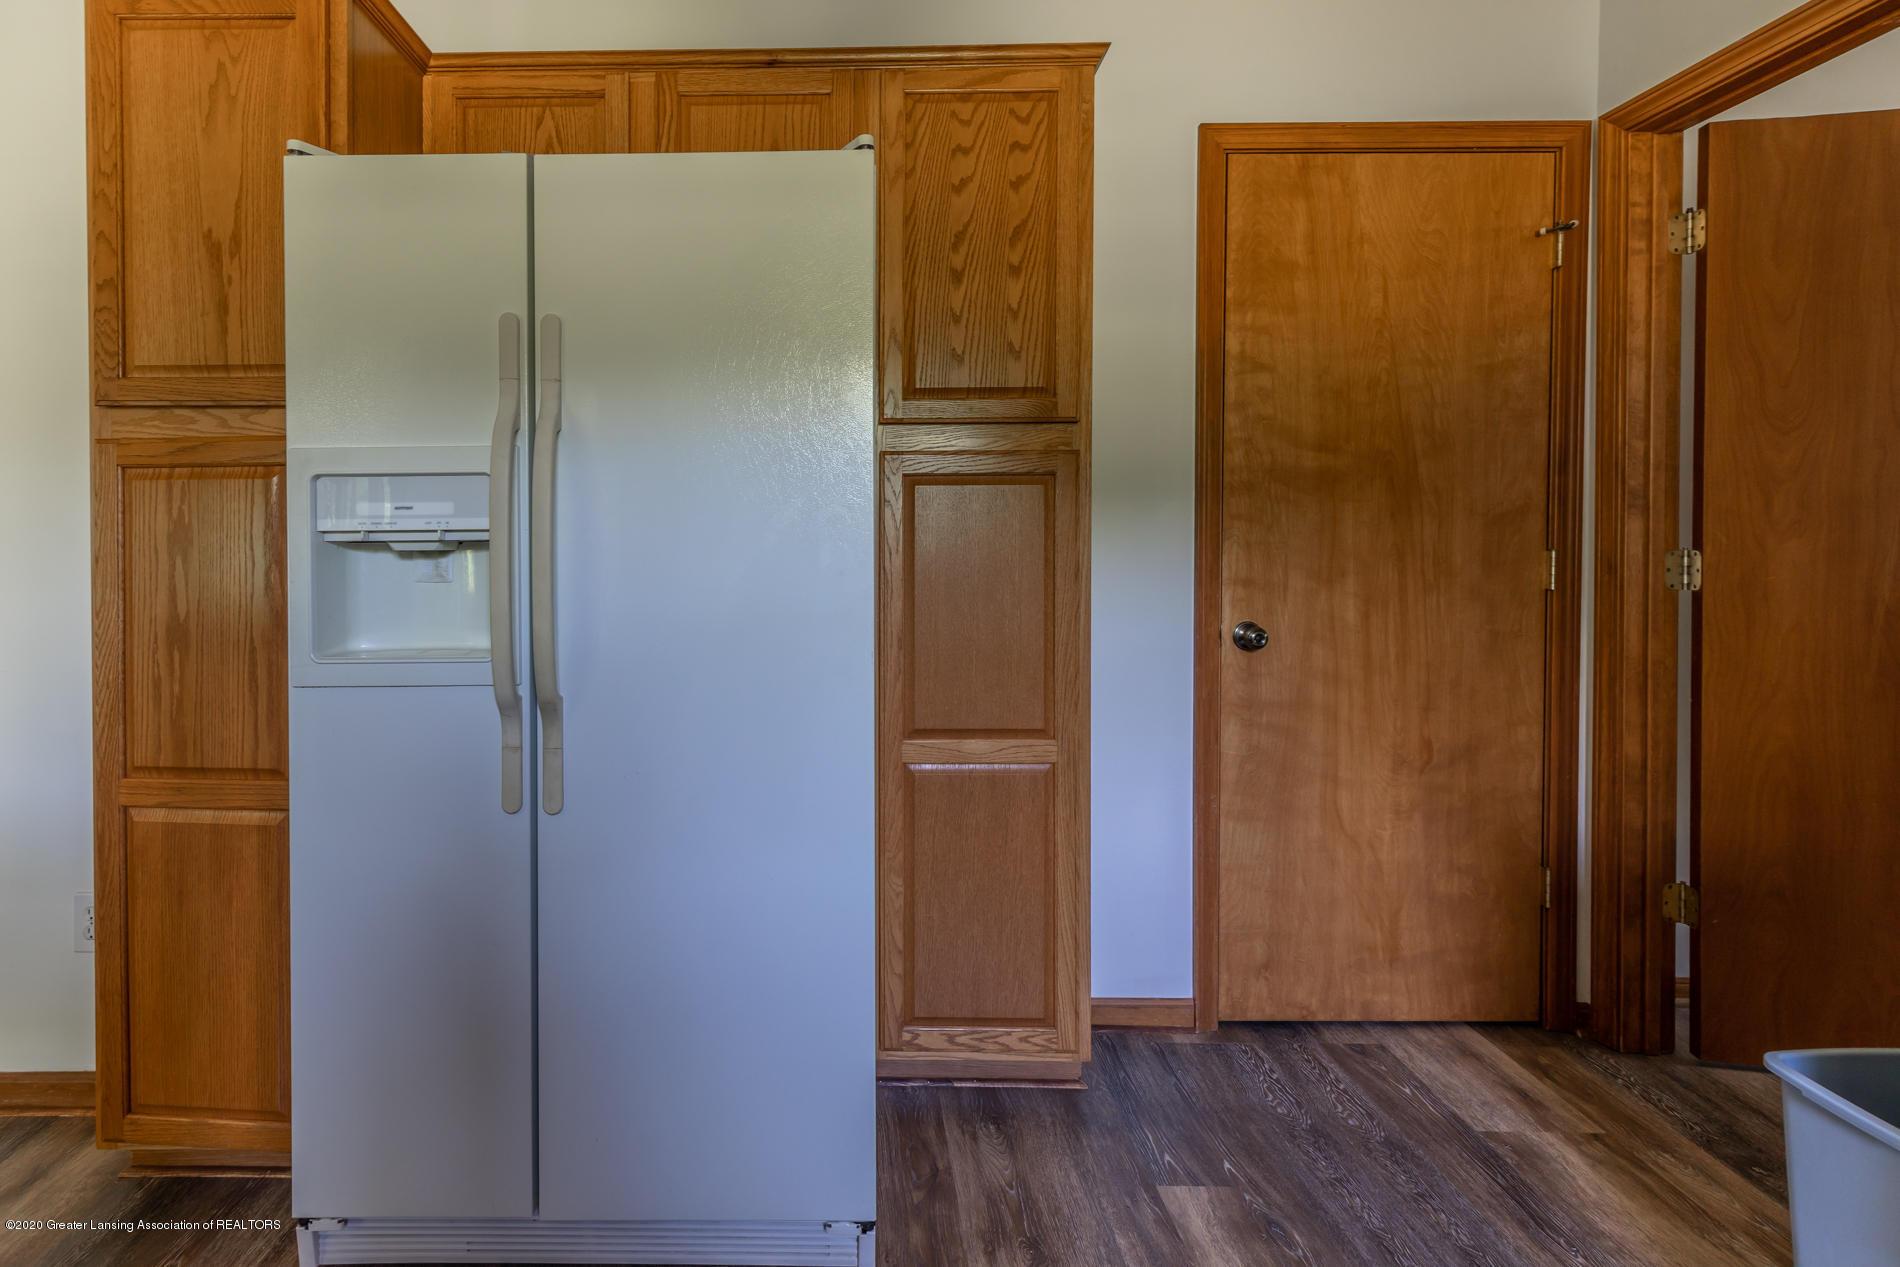 2229 S Chester Rd - Kitchen 3 - 7